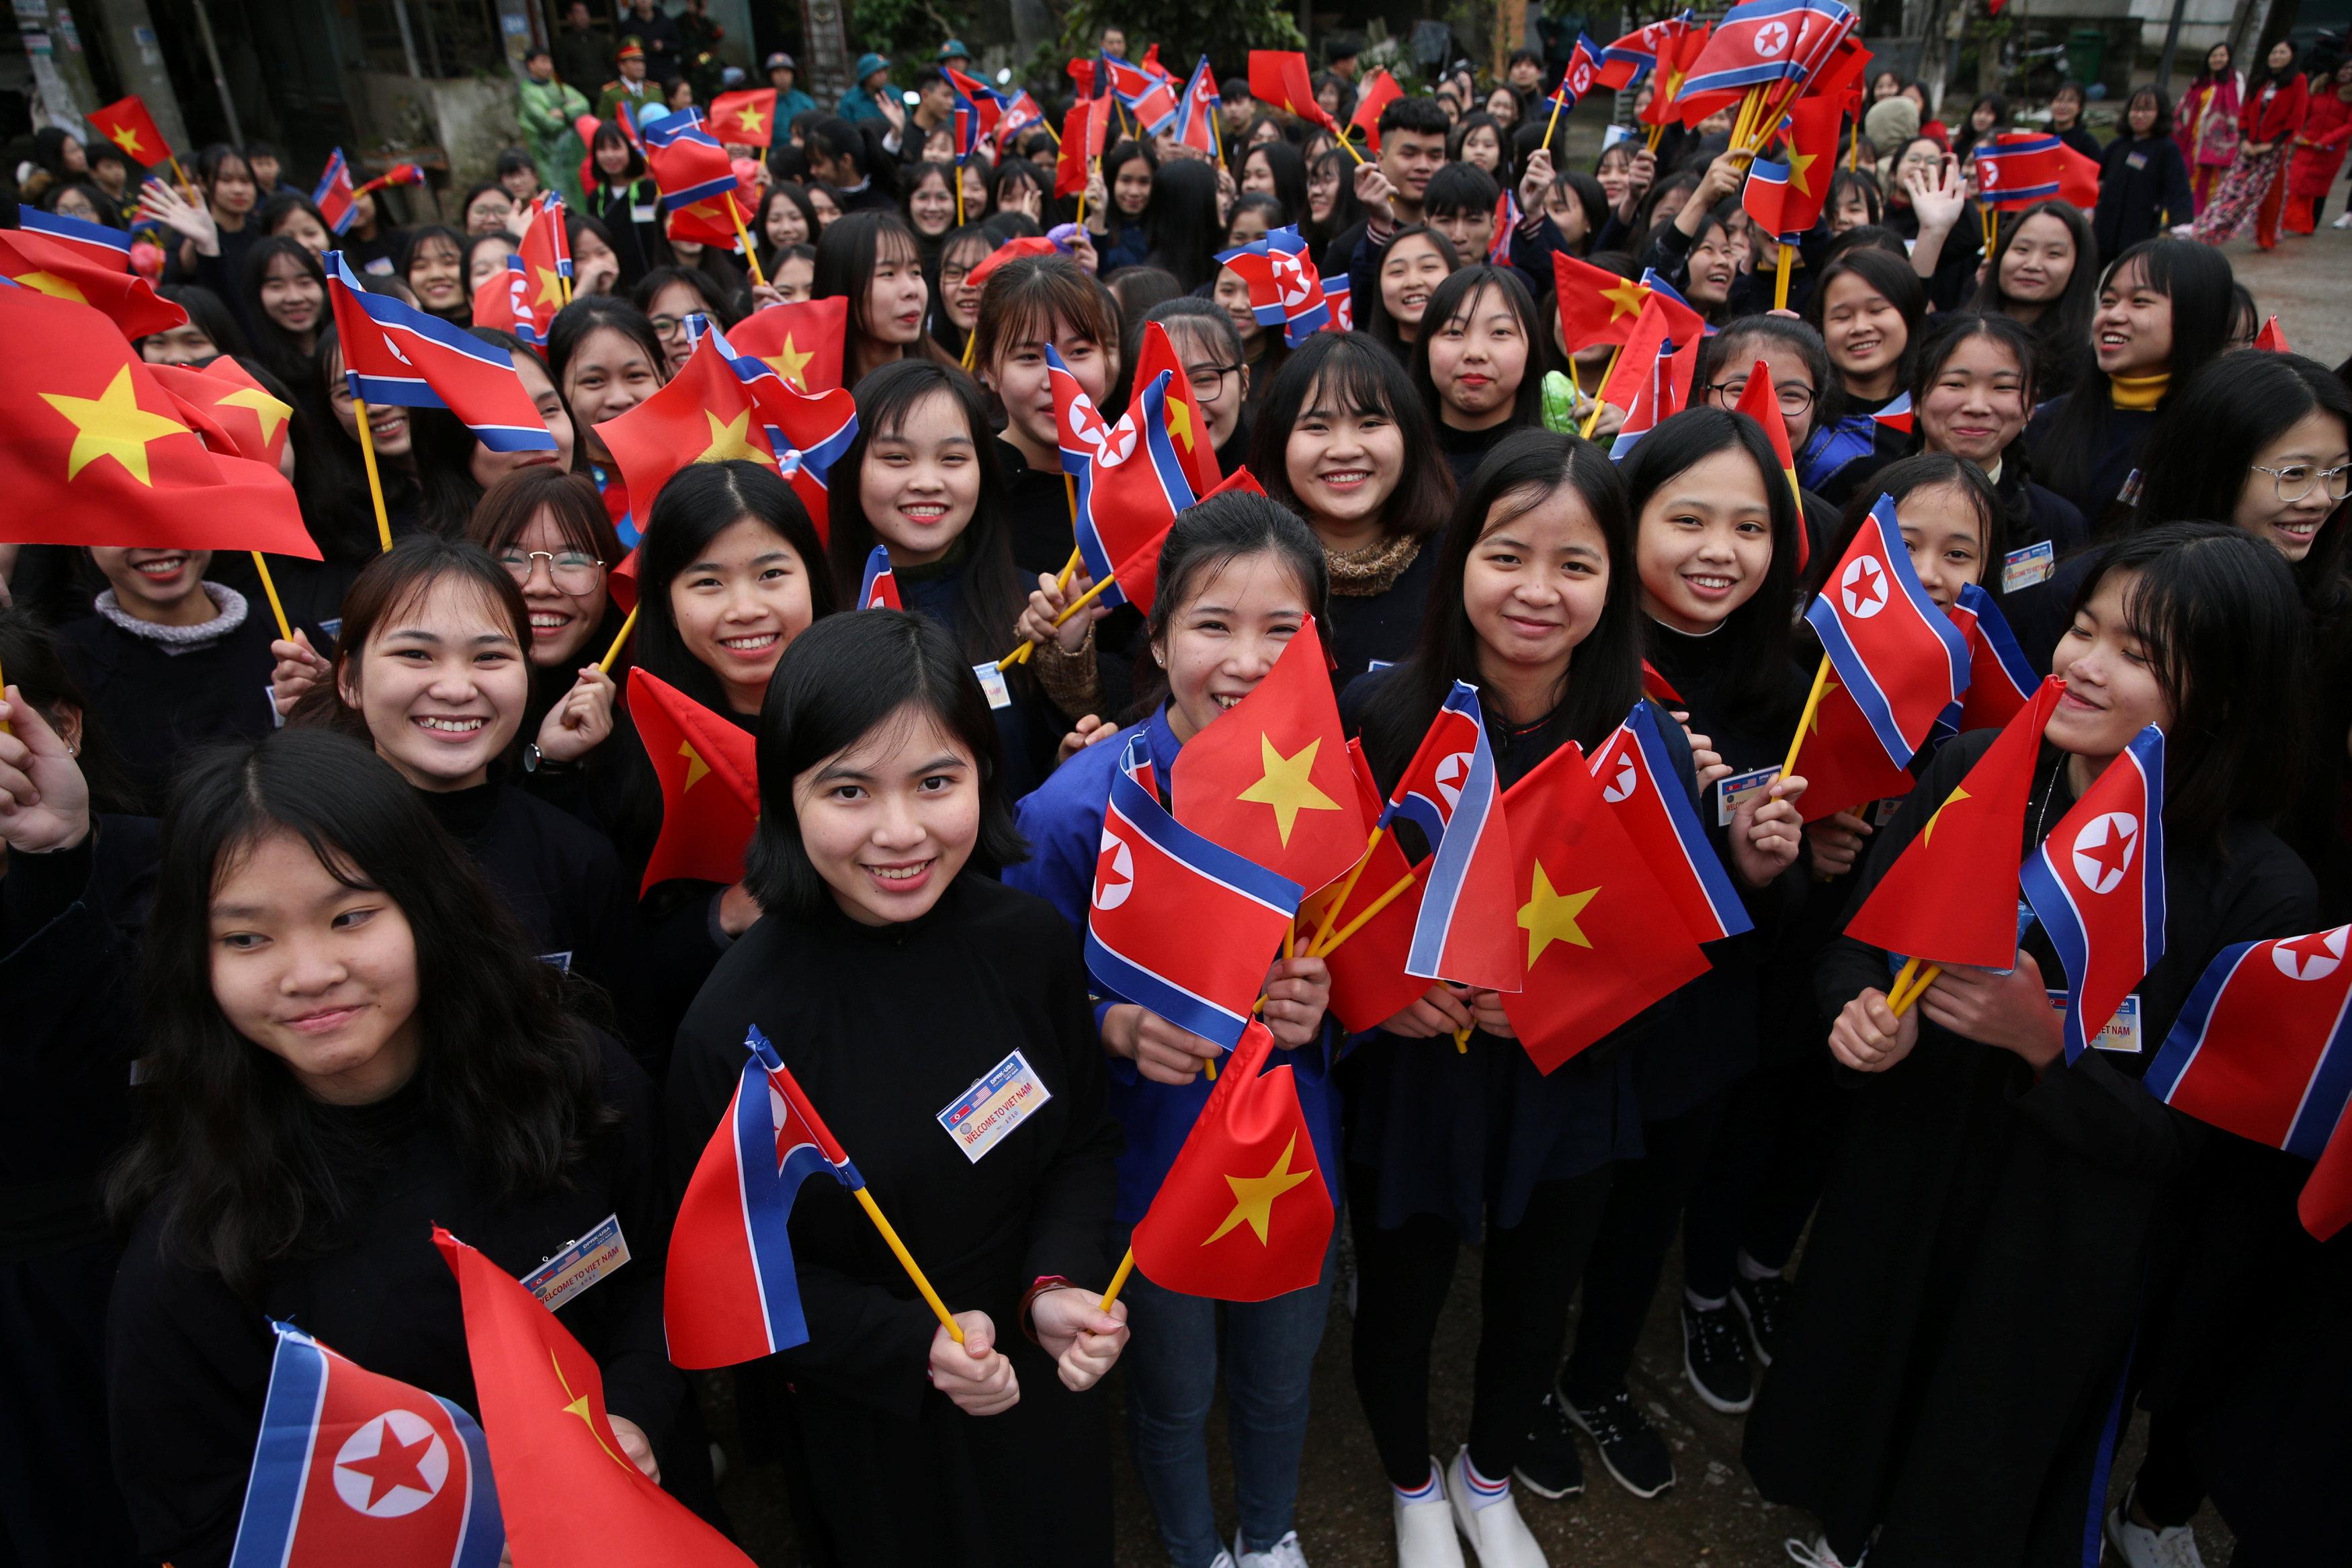 ypodochi-rok-star-gia-ton-kim-giongk-oyn-sto-vietnam-fotografies7